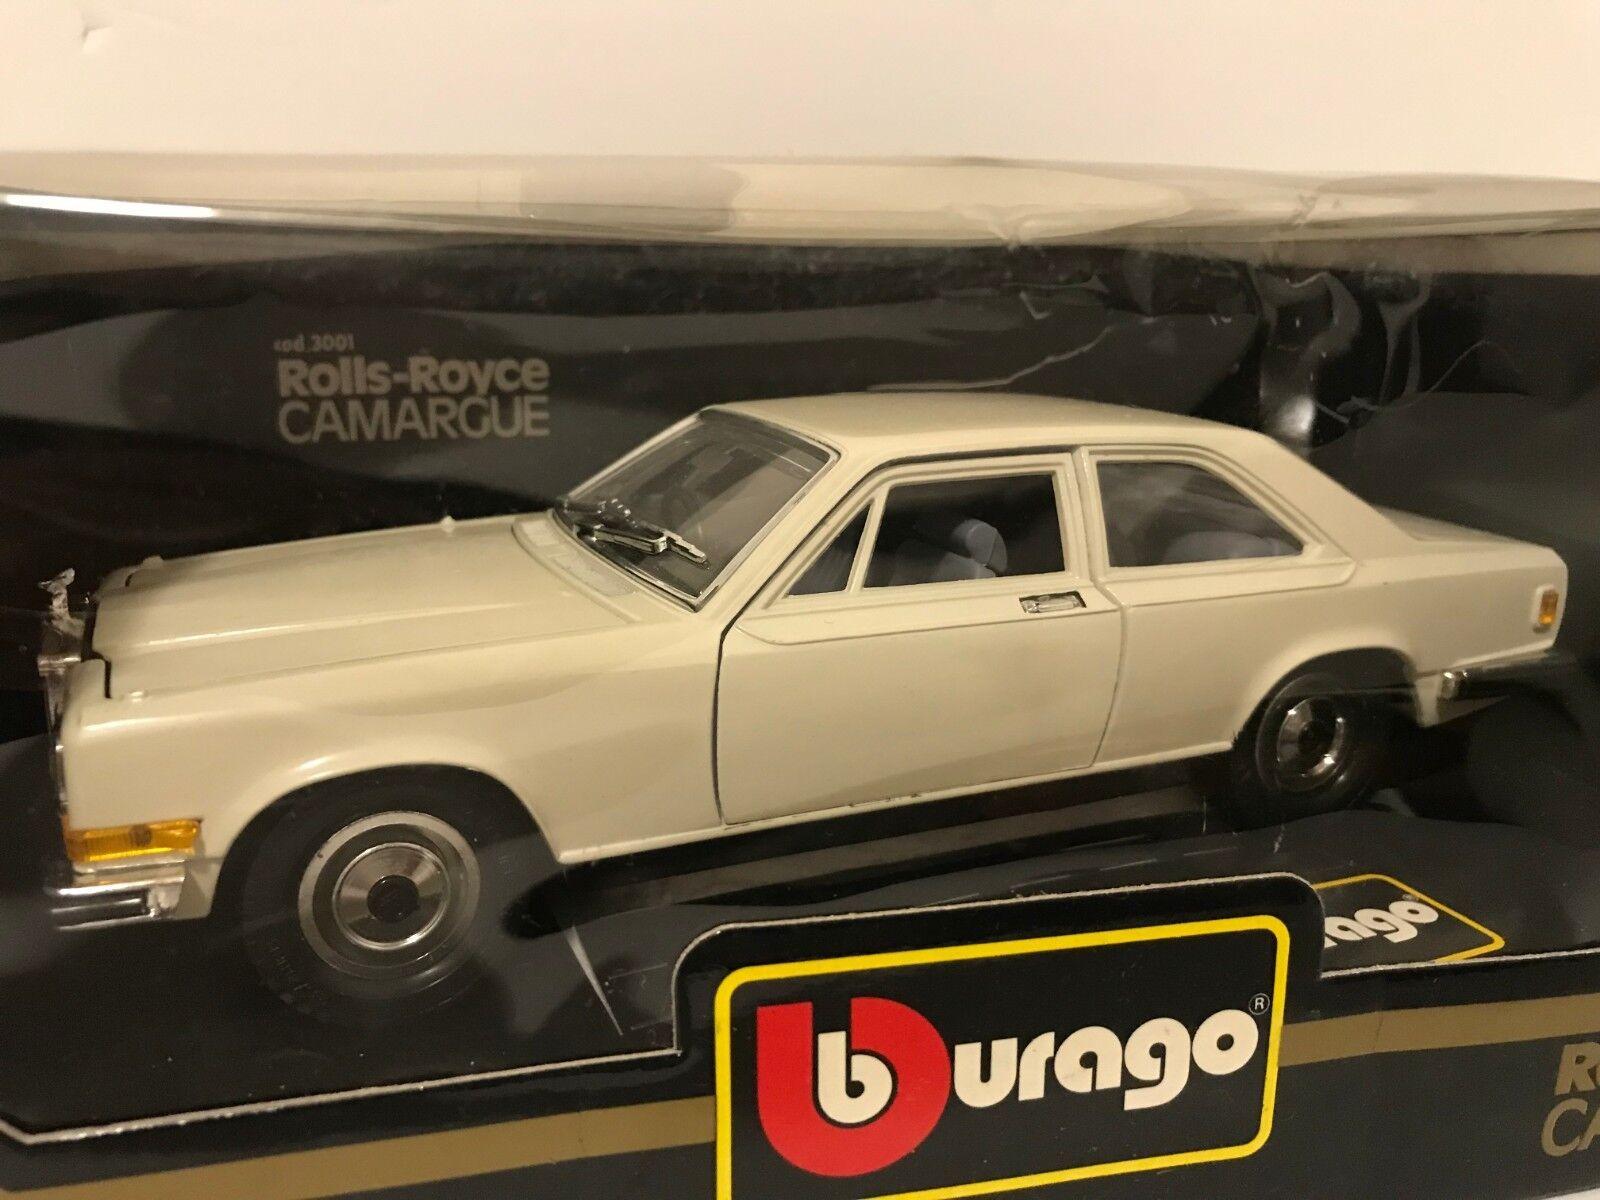 Burago Rolls Royce Camargue Diecast Diecast Diecast Escala 1 22 Nuevo En Caja af7f3c